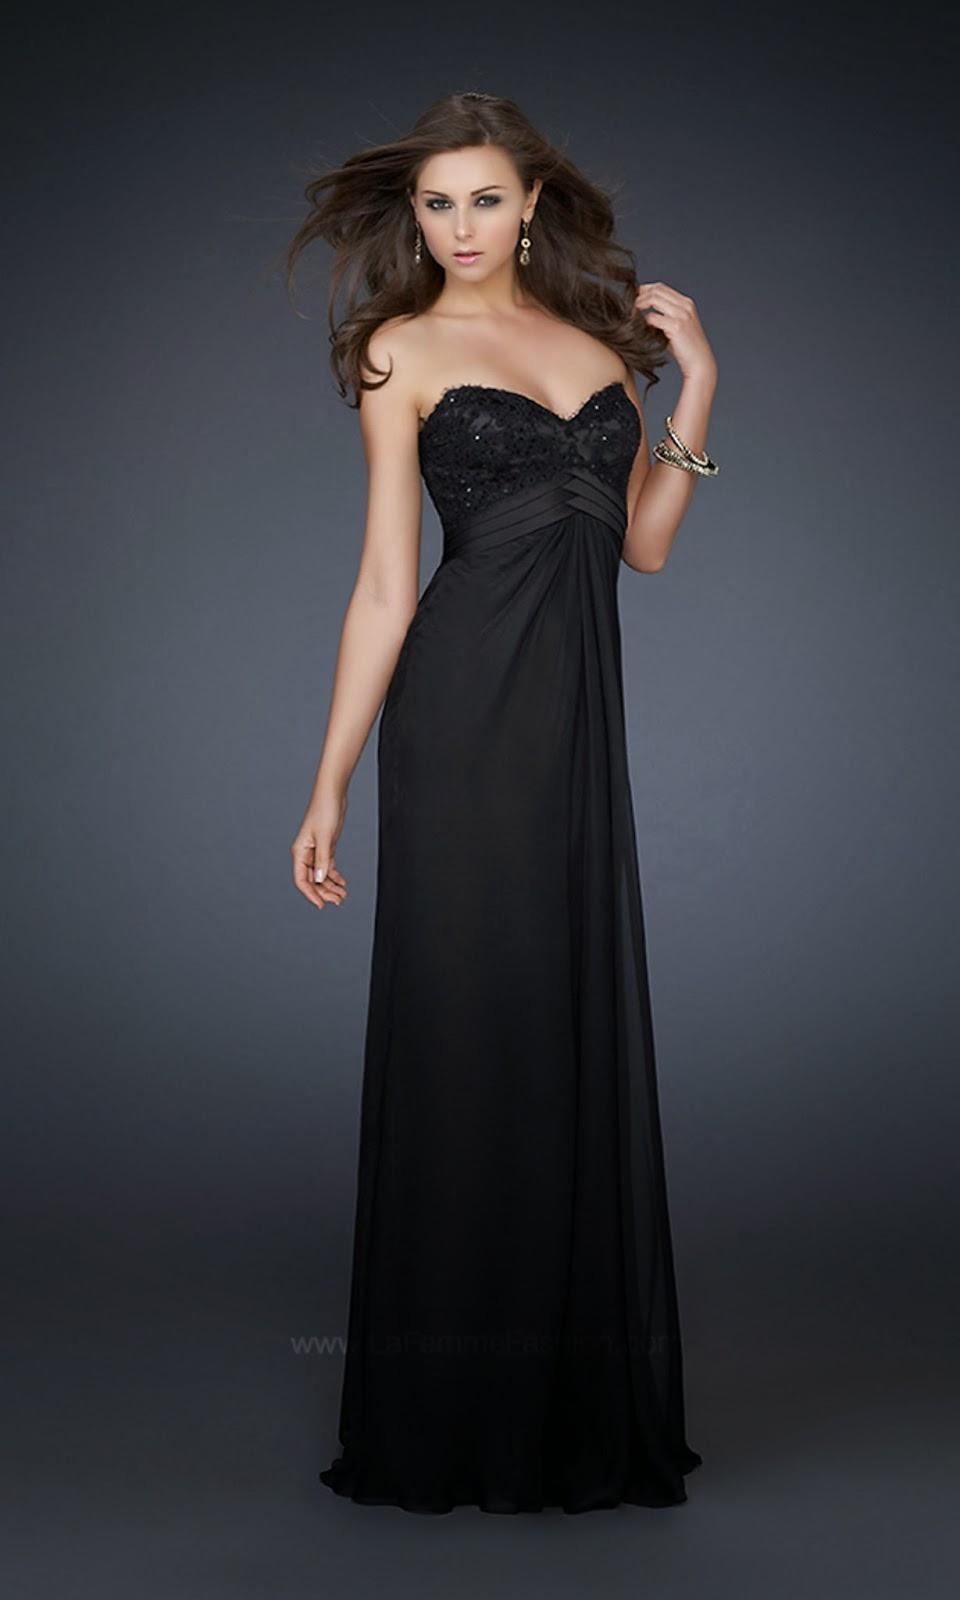 classy evening dresses photo - 1